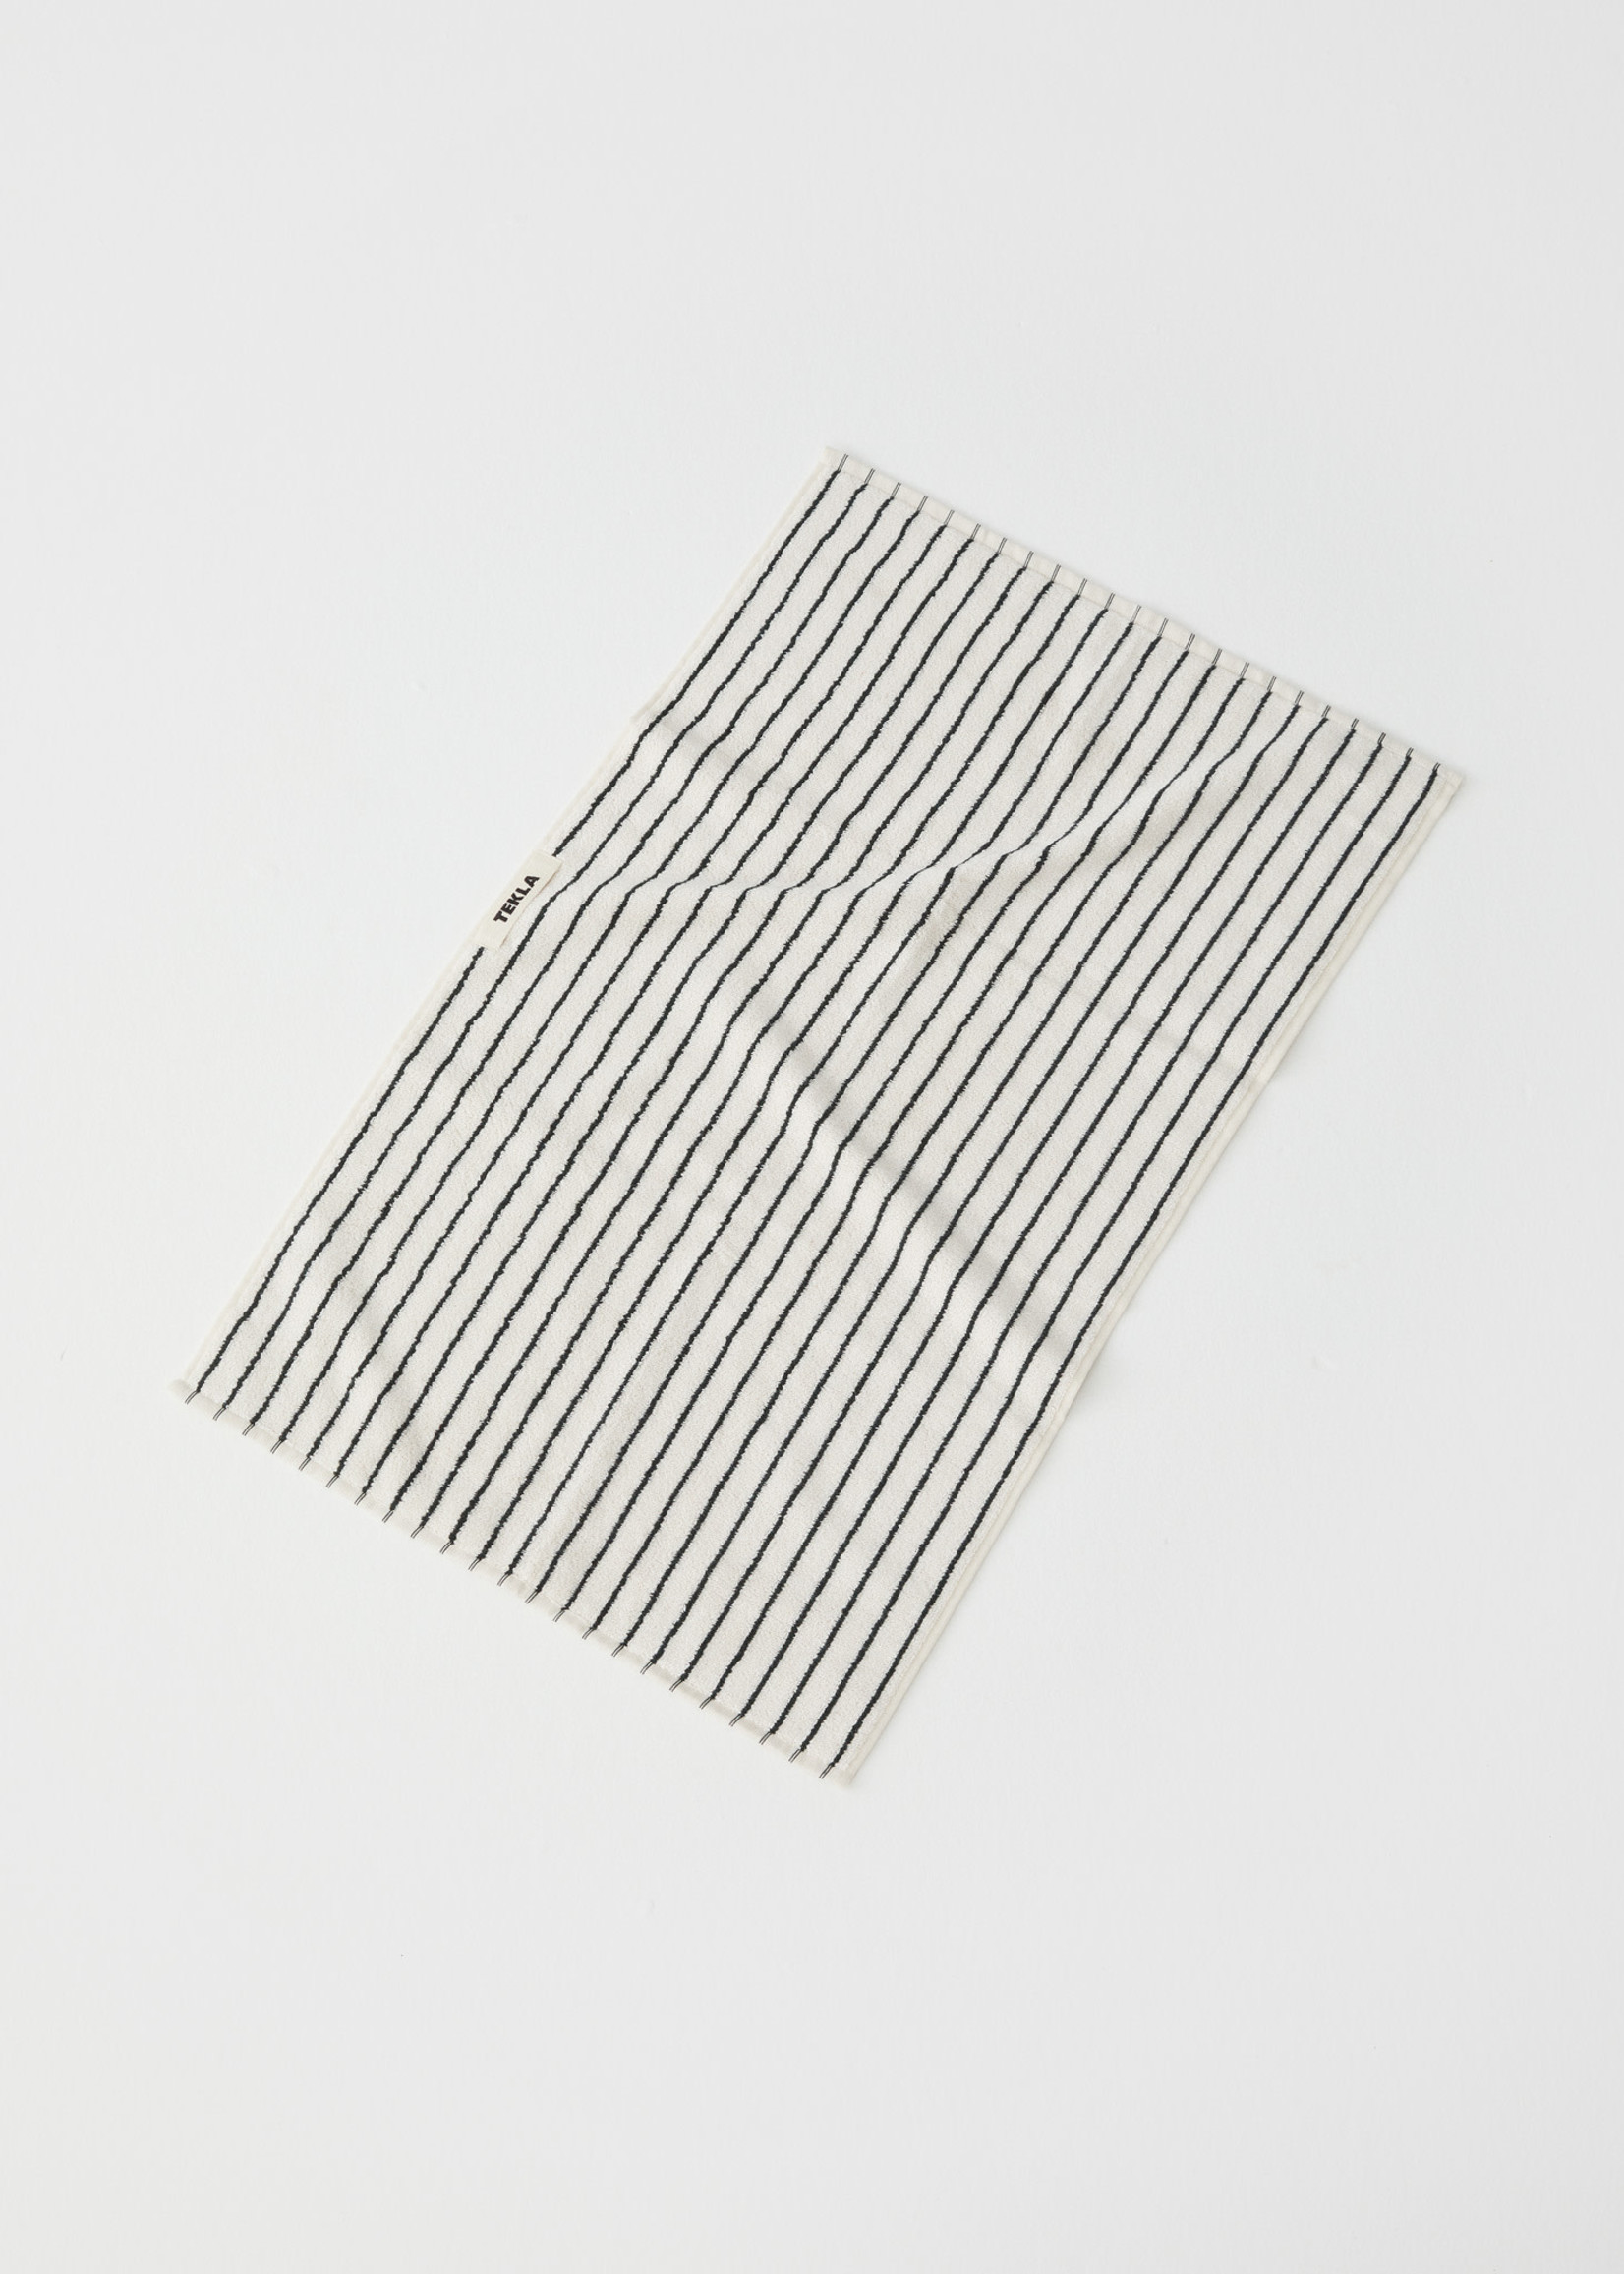 TEKLA Organic Hand Towel in Dark Green Stripe